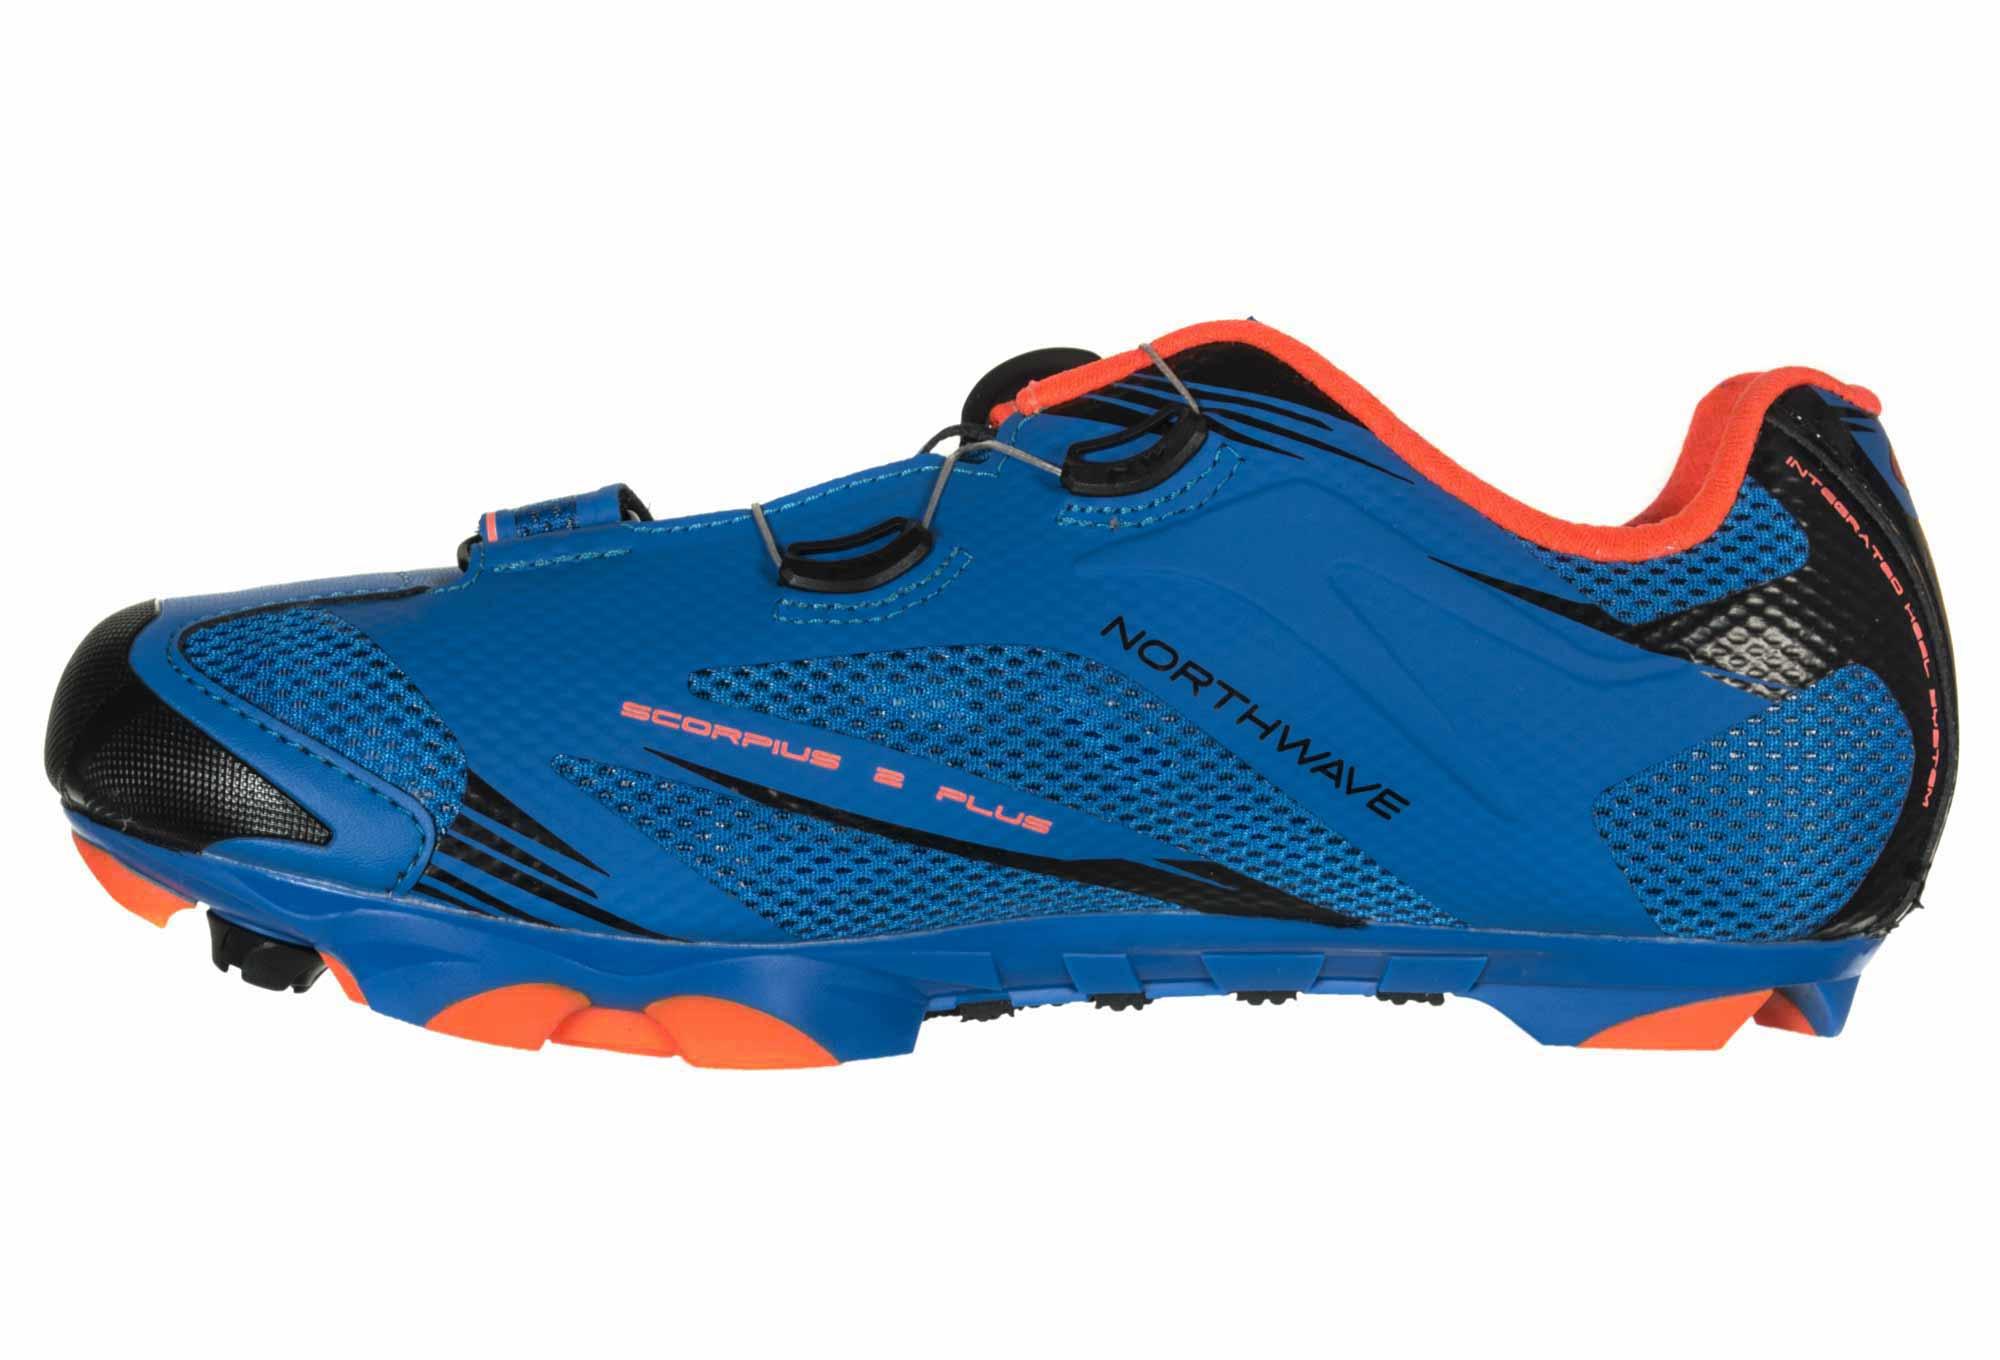 Mtb Plus Zapatillas Northwave Naranja 2 Scorpius Azul E29IHD